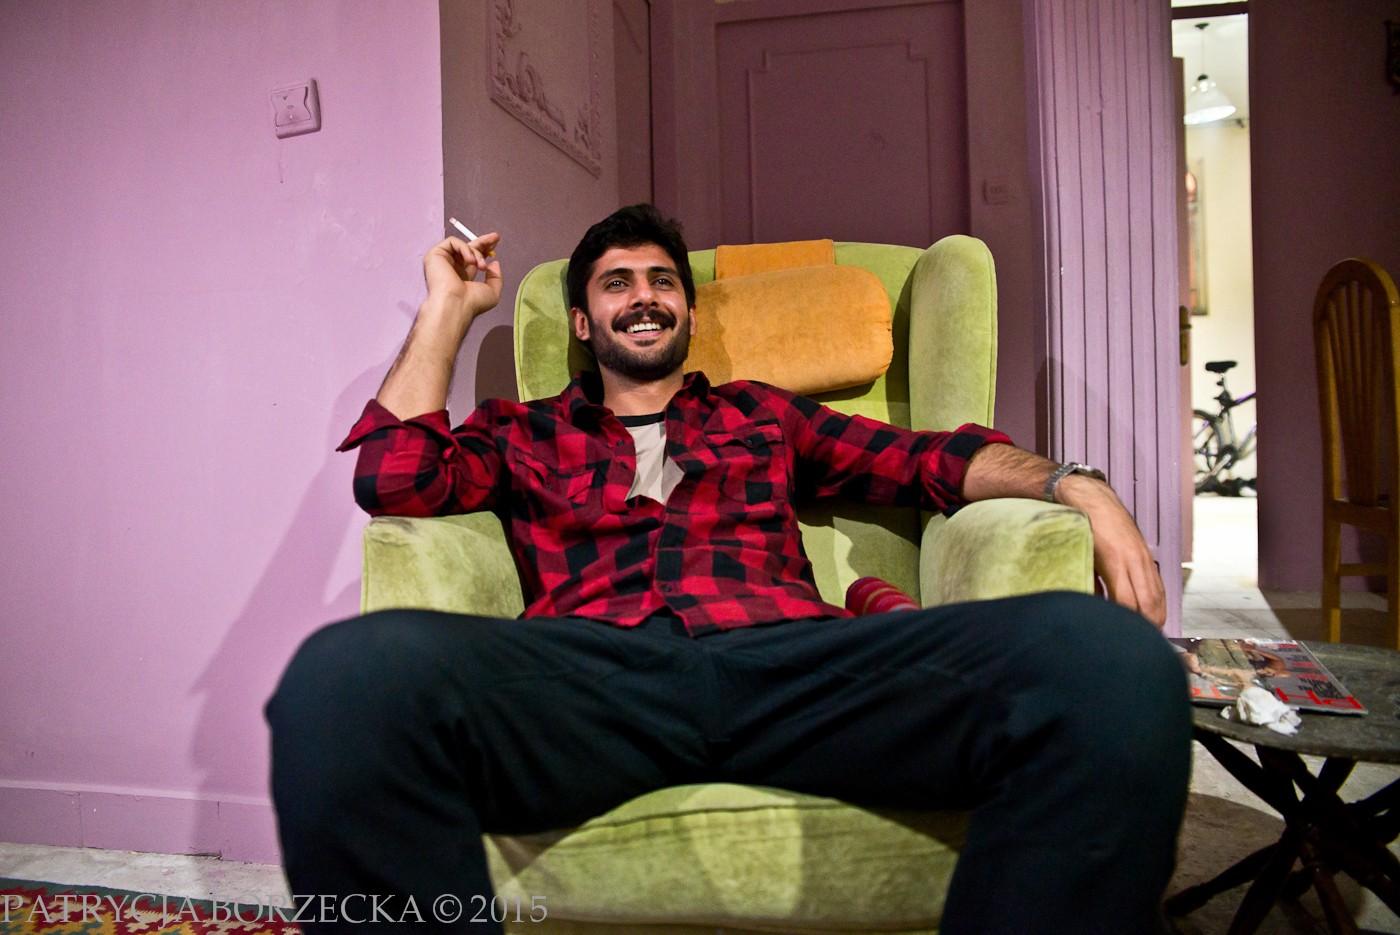 PatrycjaBorzecka-photography-Iran-people15